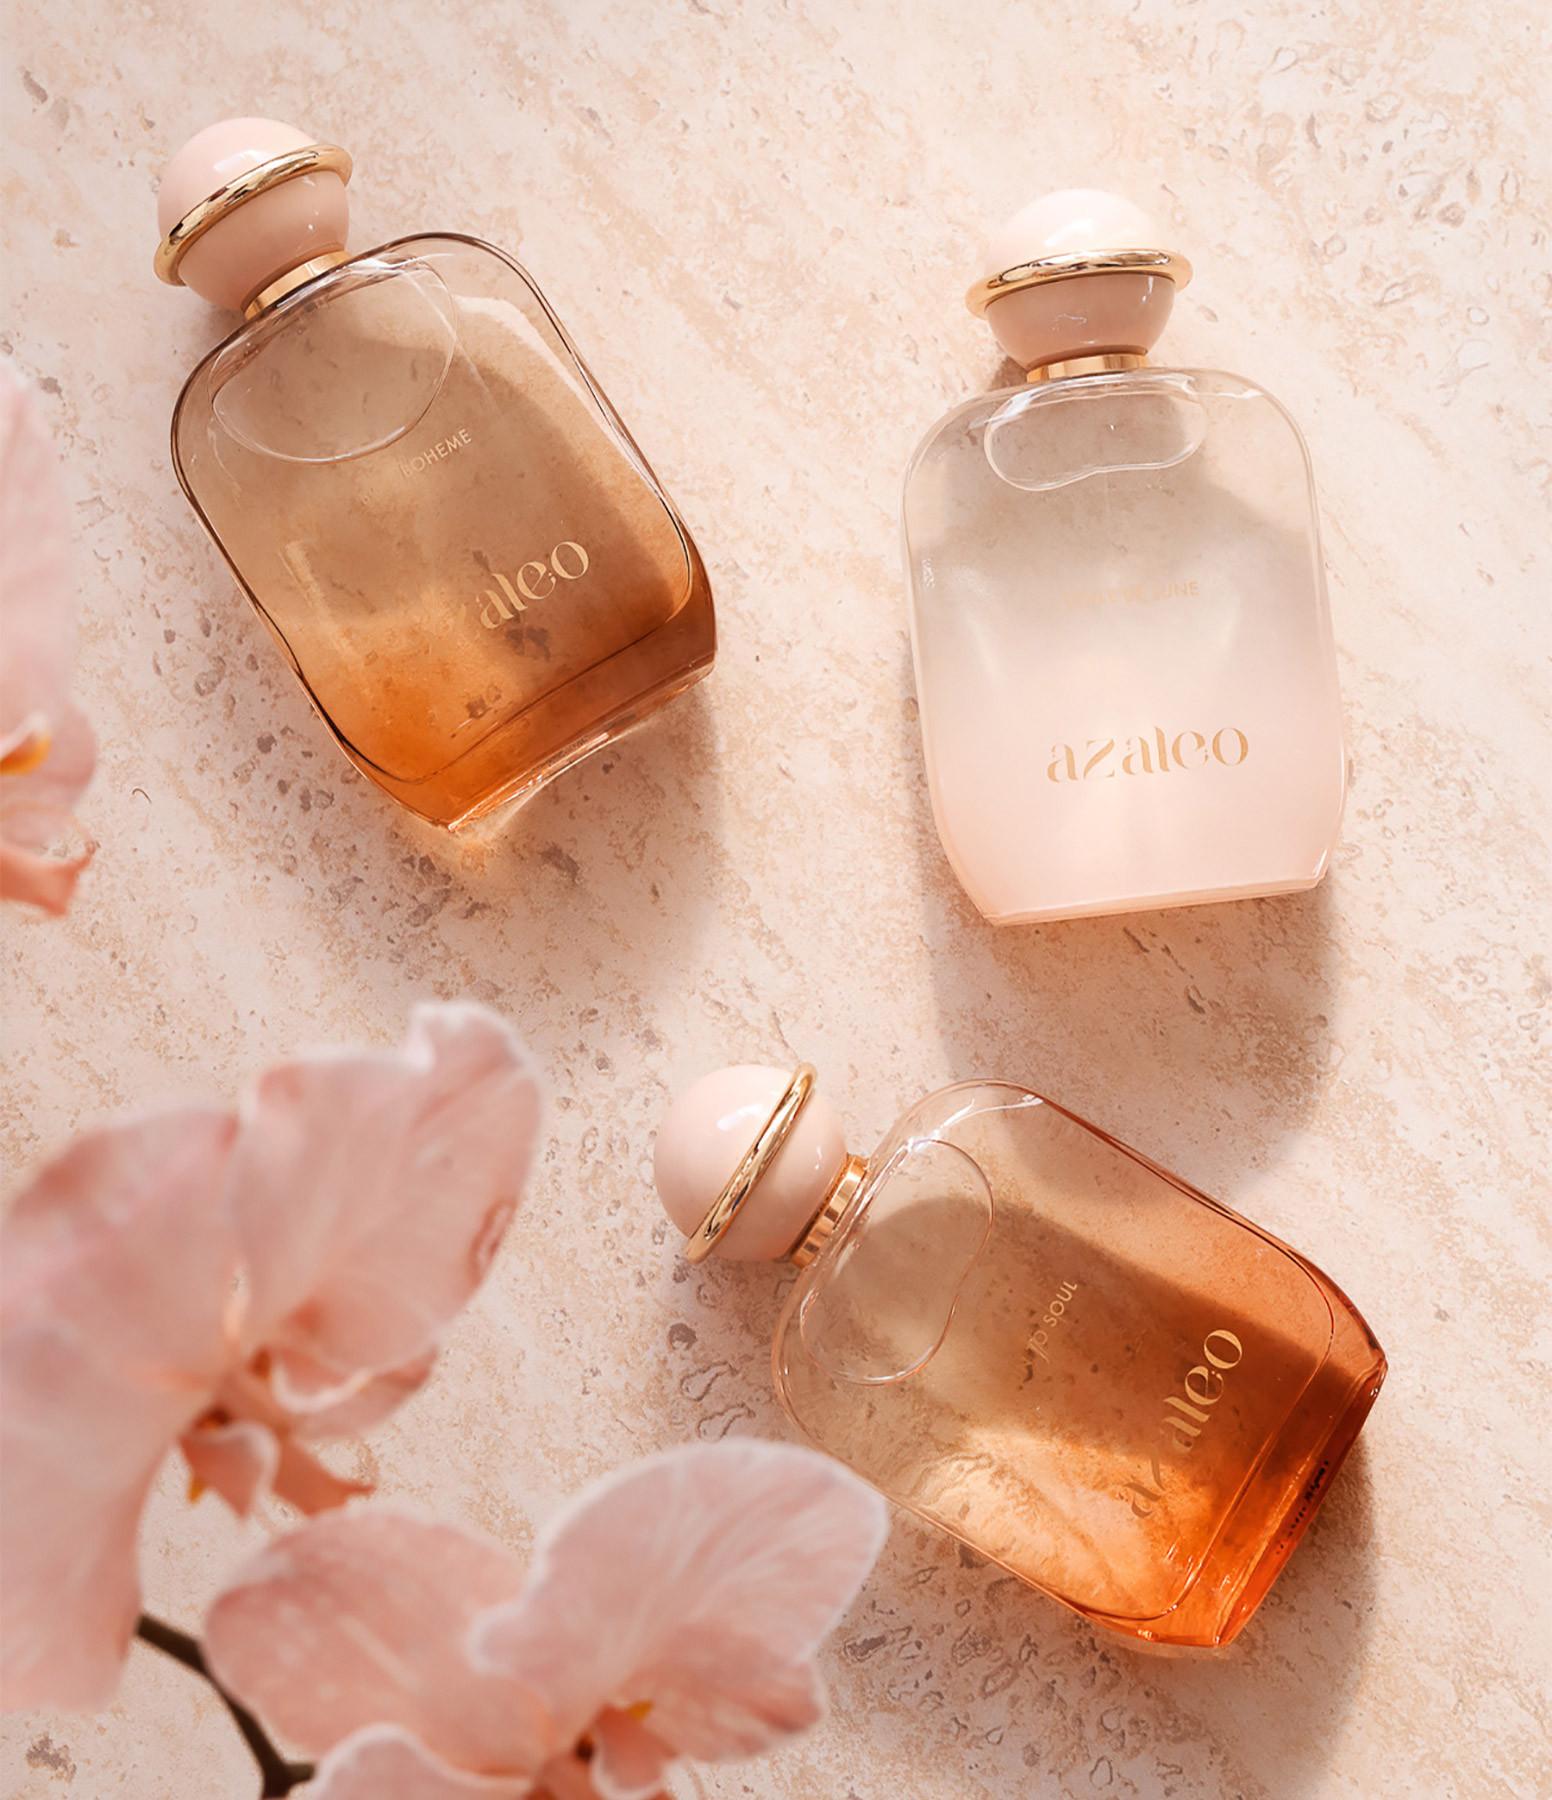 AZALEO - Eau de Parfum Sun to Soul